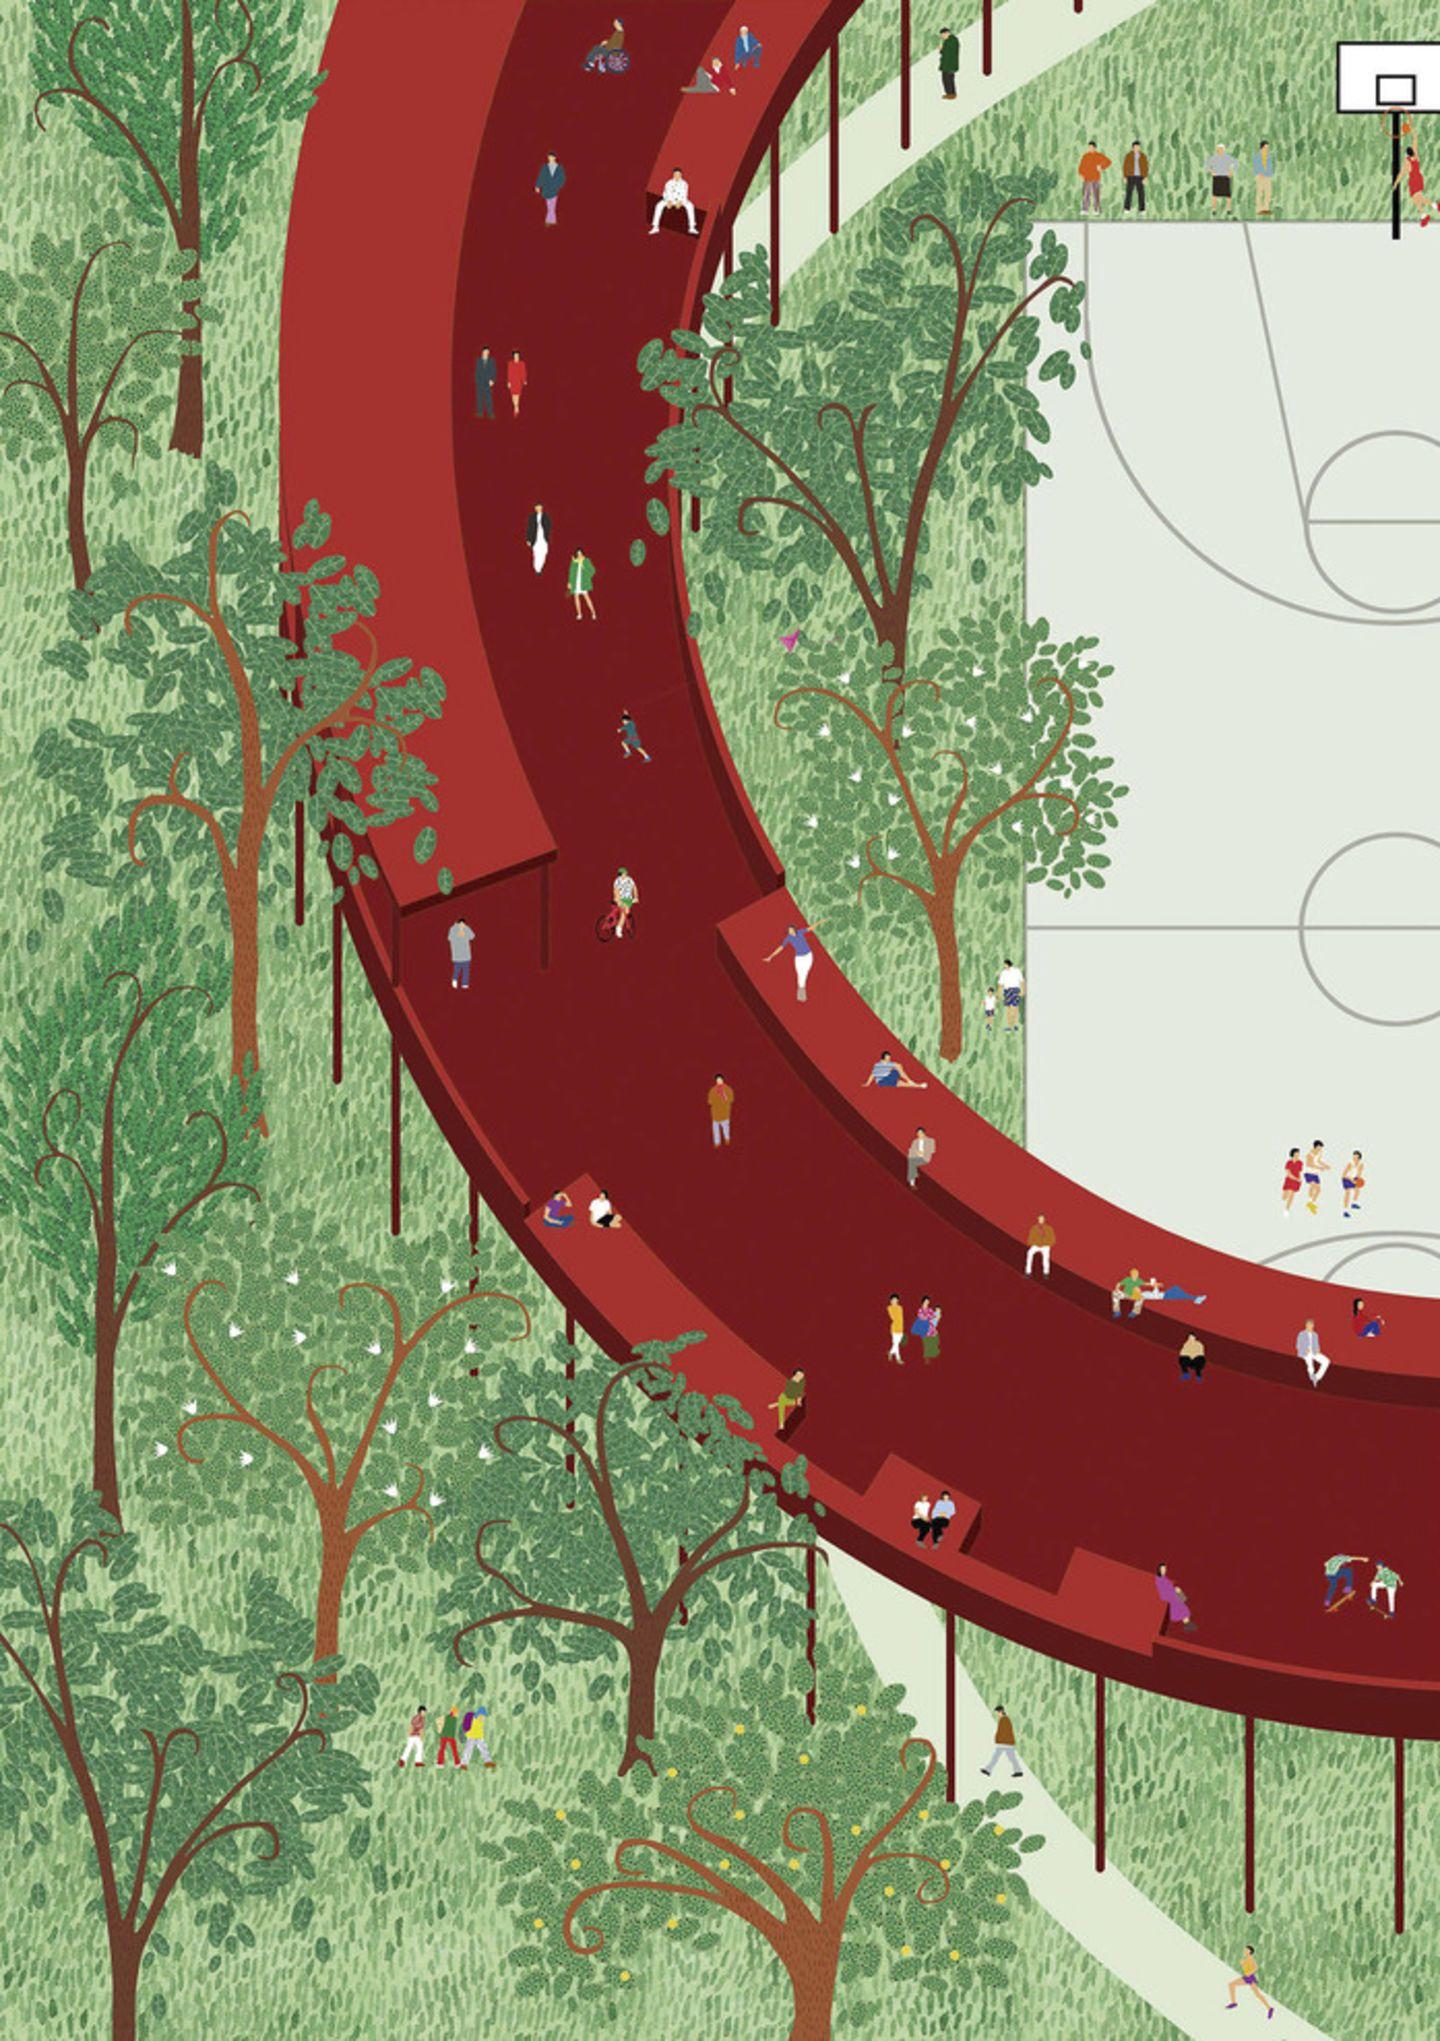 1000 Images About Landscape Visuals Graphics On Pinterest